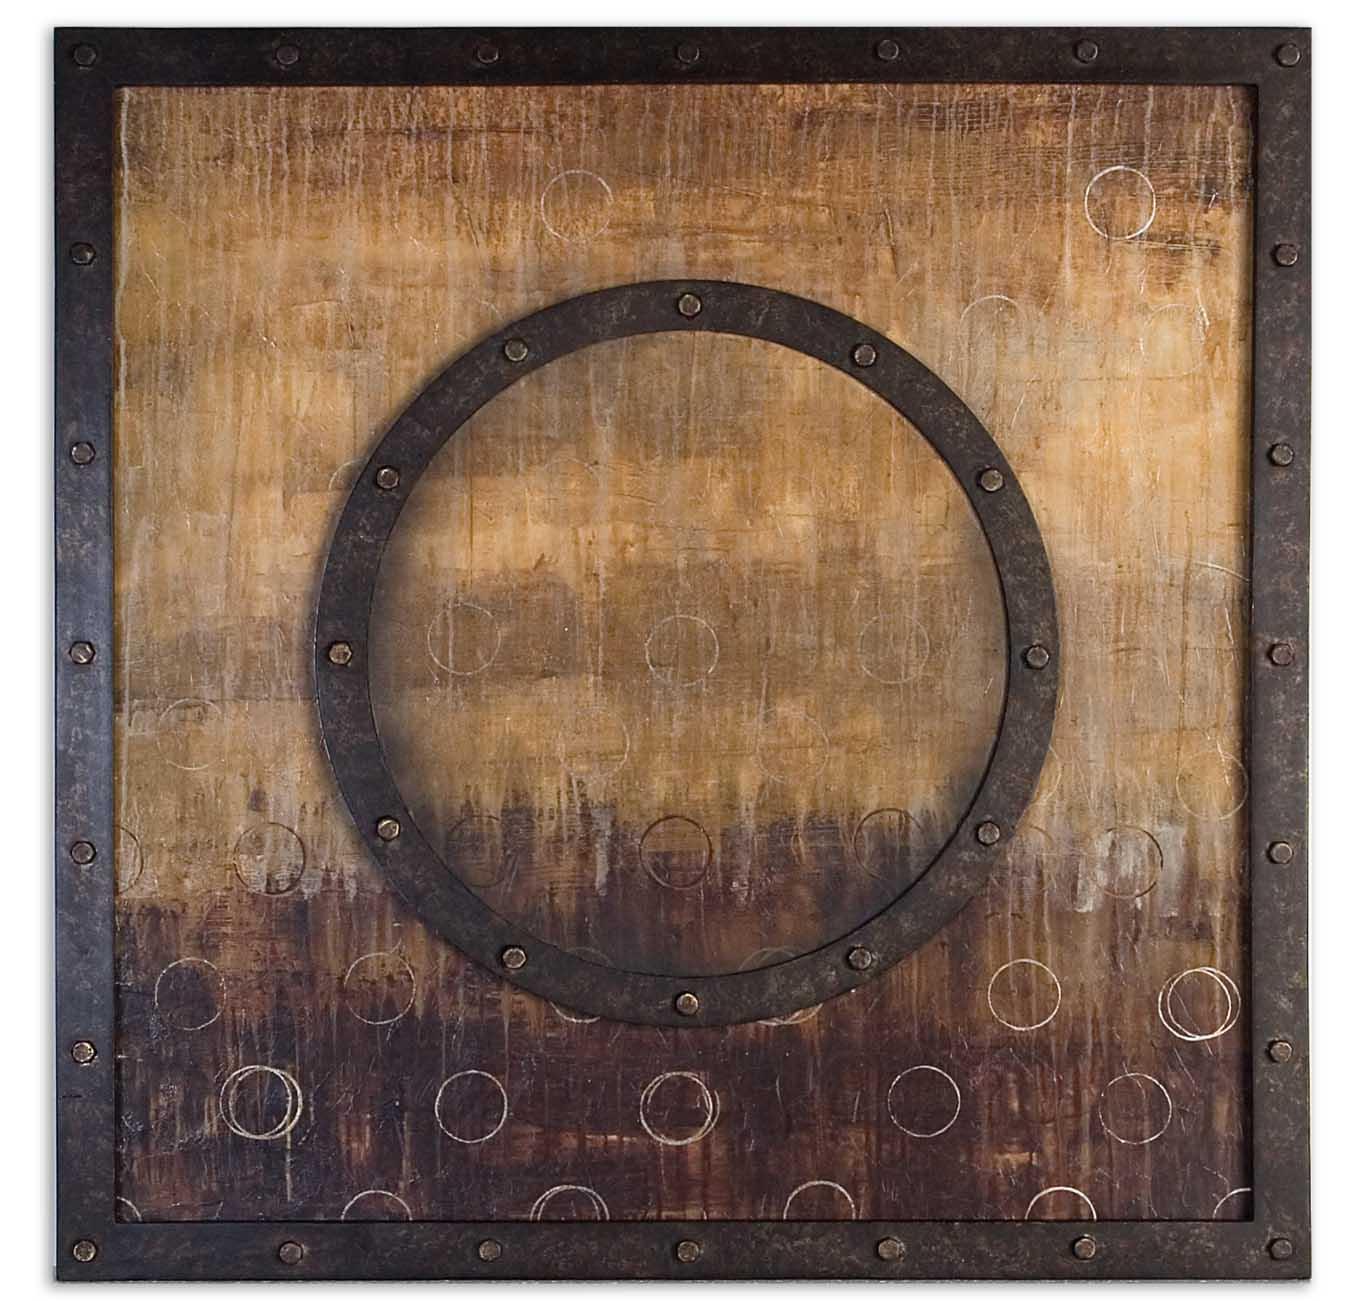 Uttermost Art Mink Stole - Item Number: 51062